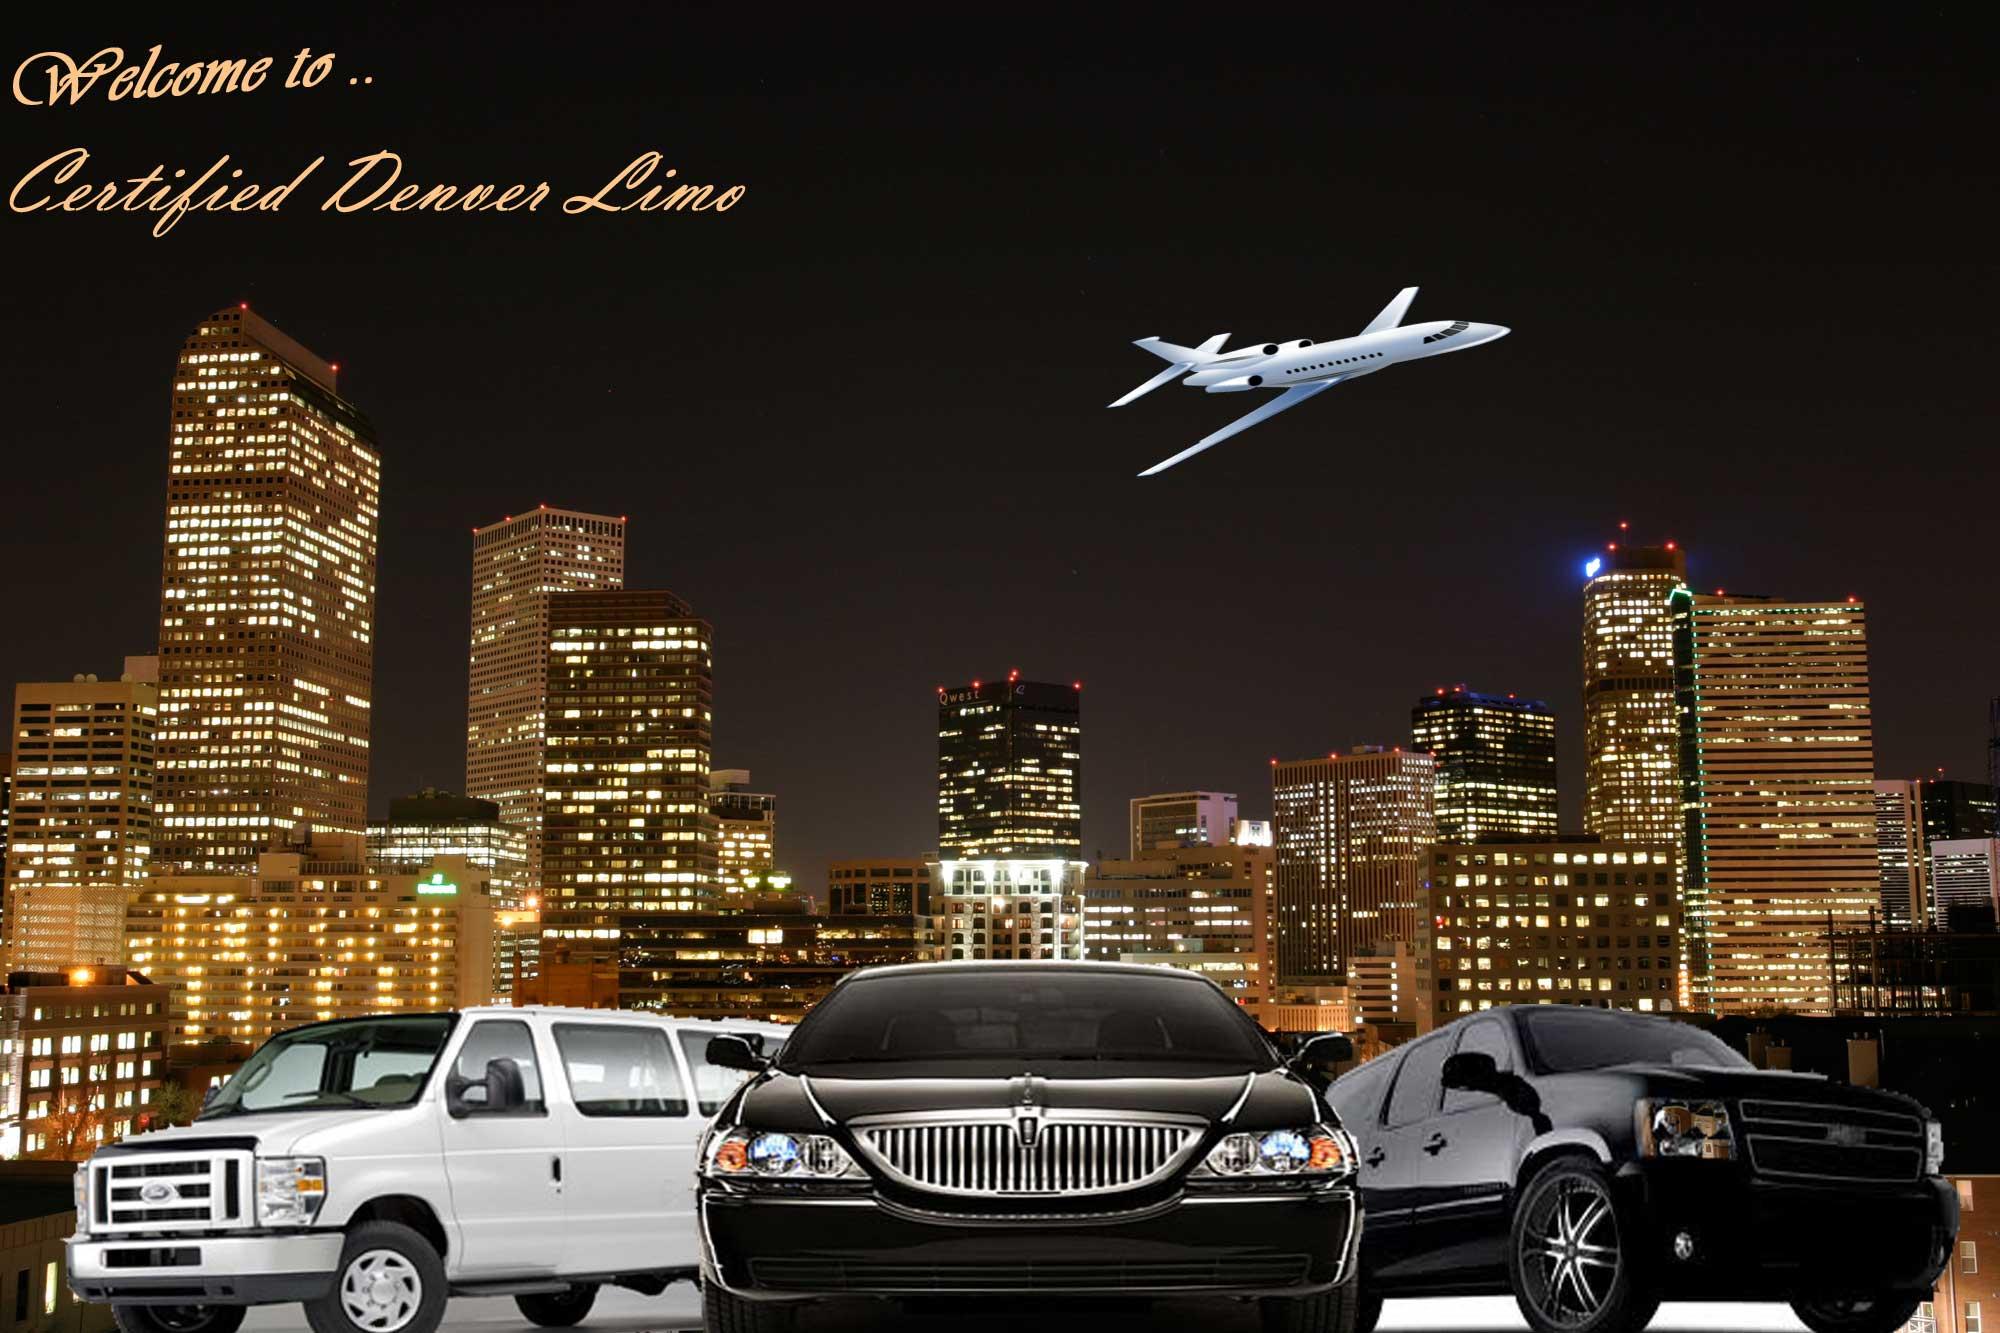 Airport Transportation Denver CO